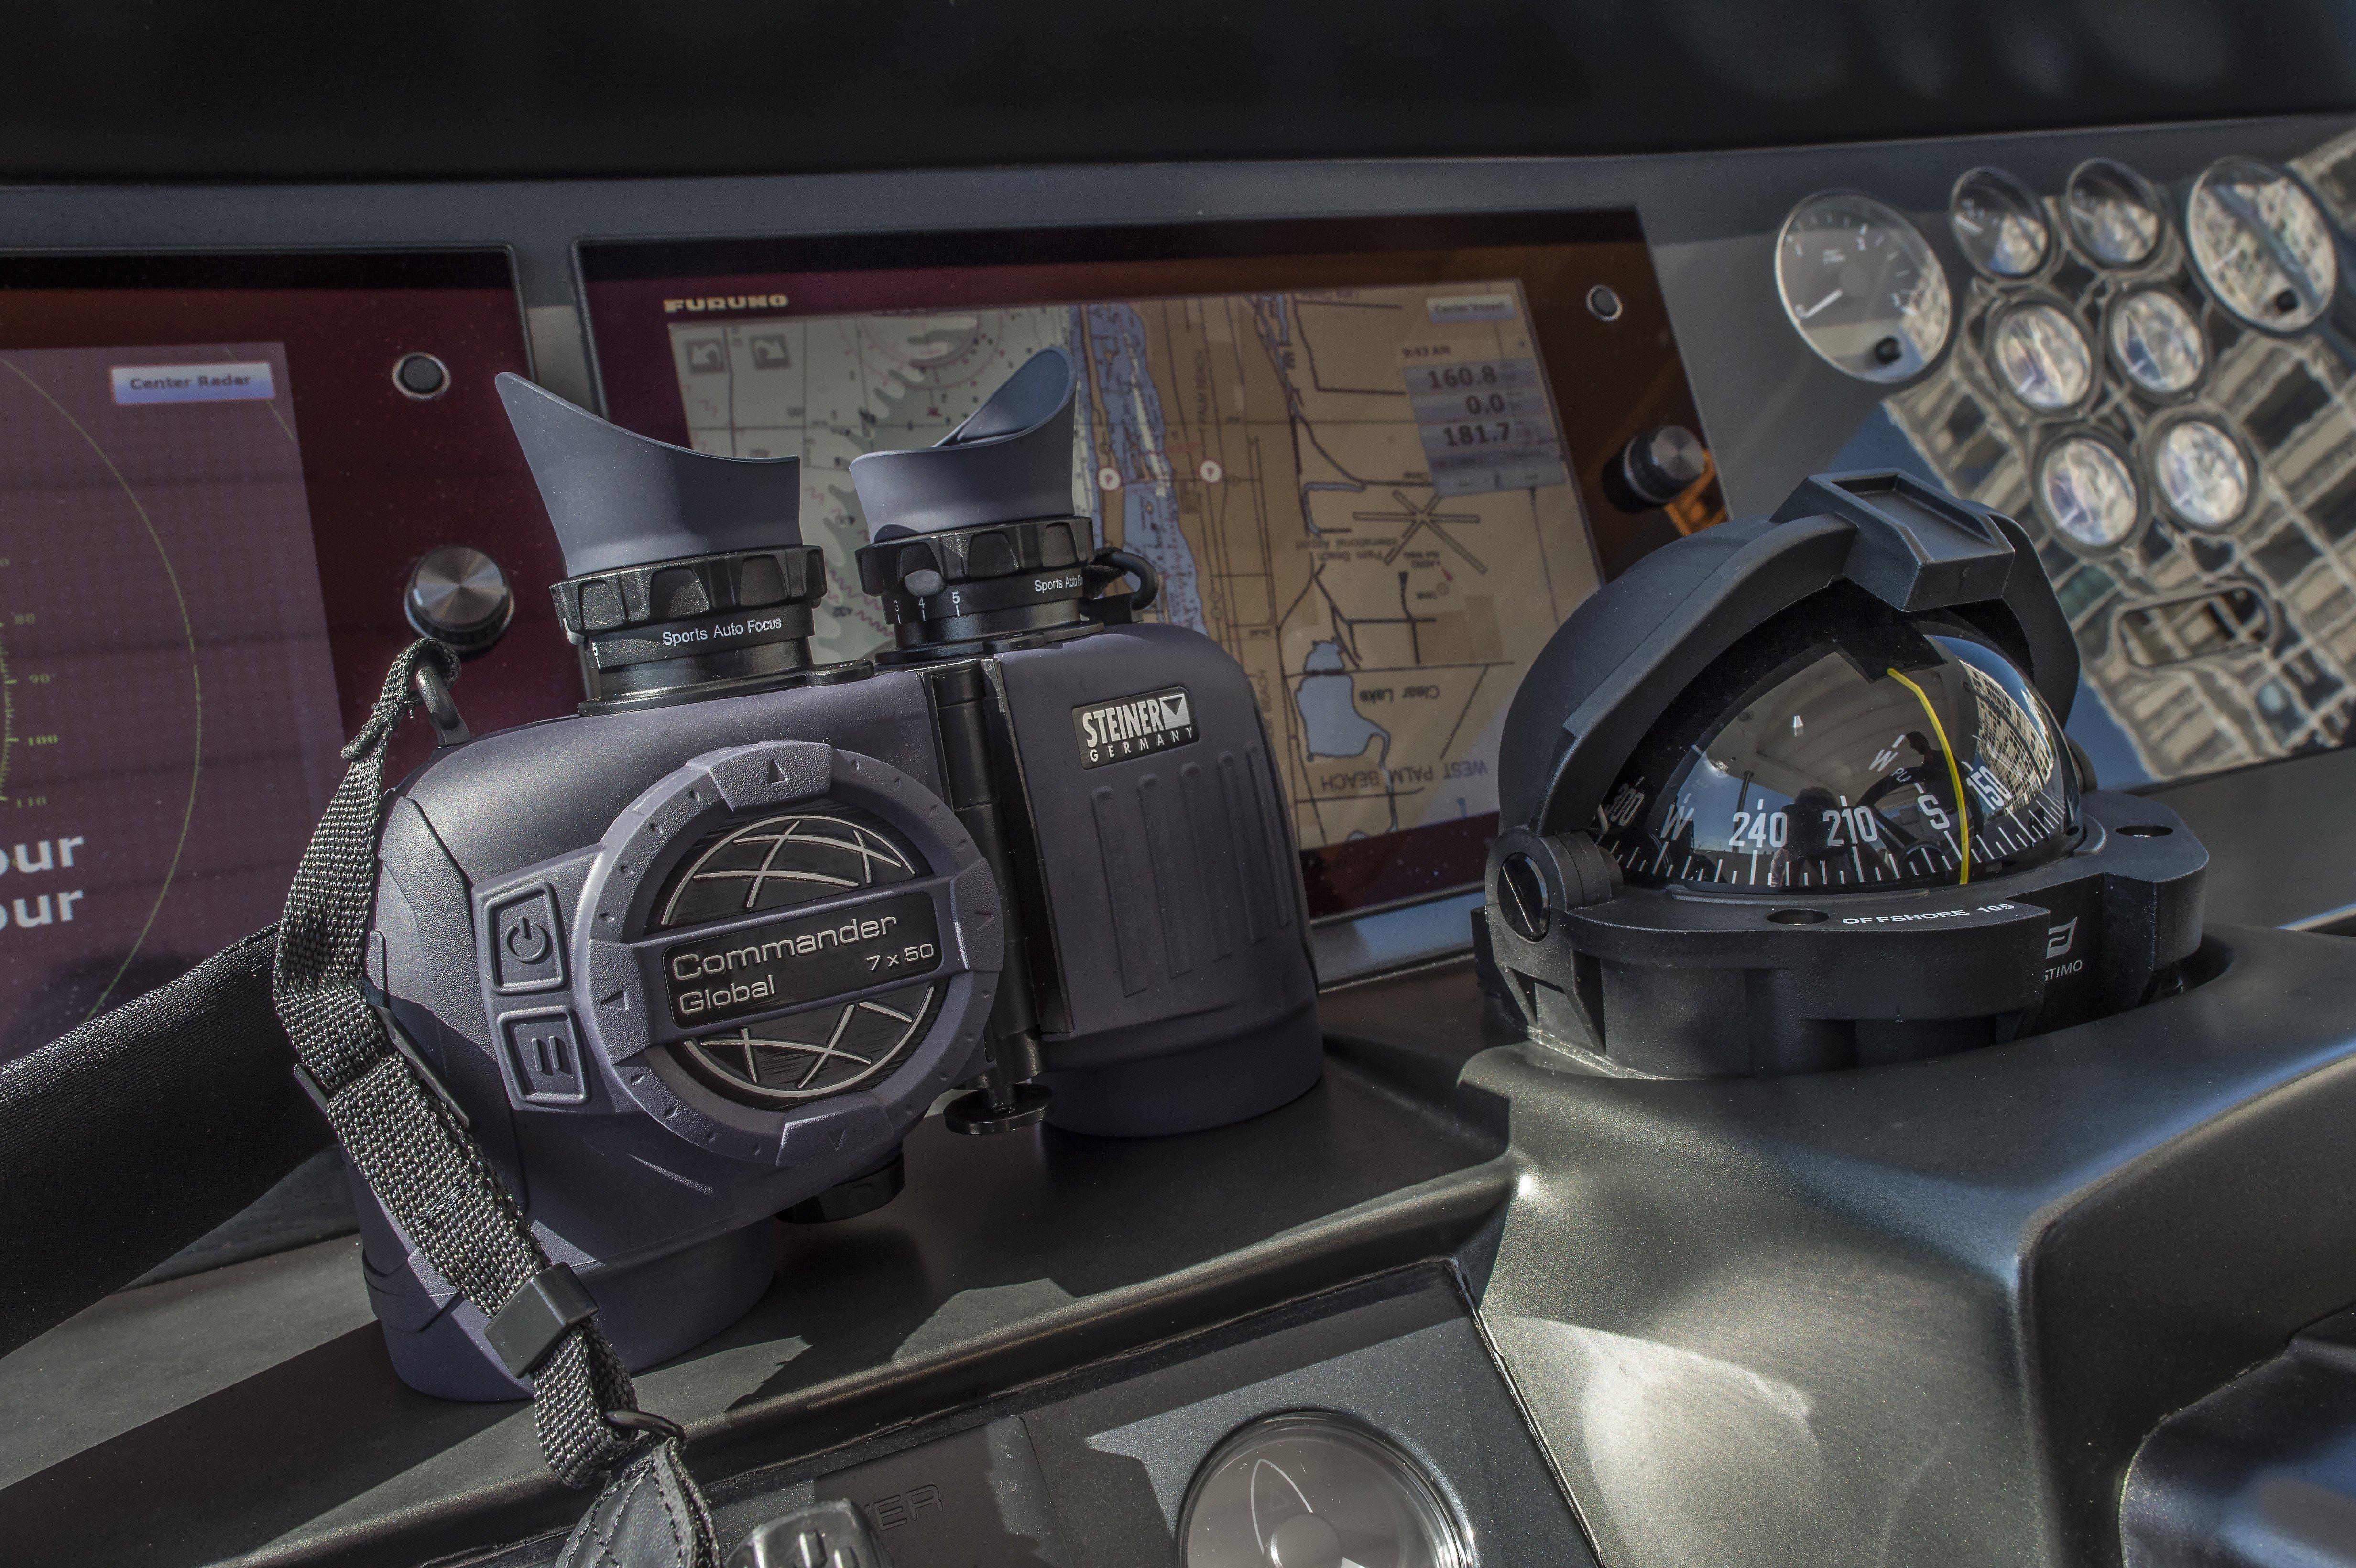 Steiner Commander Global 7x50 - Marine Binoculars